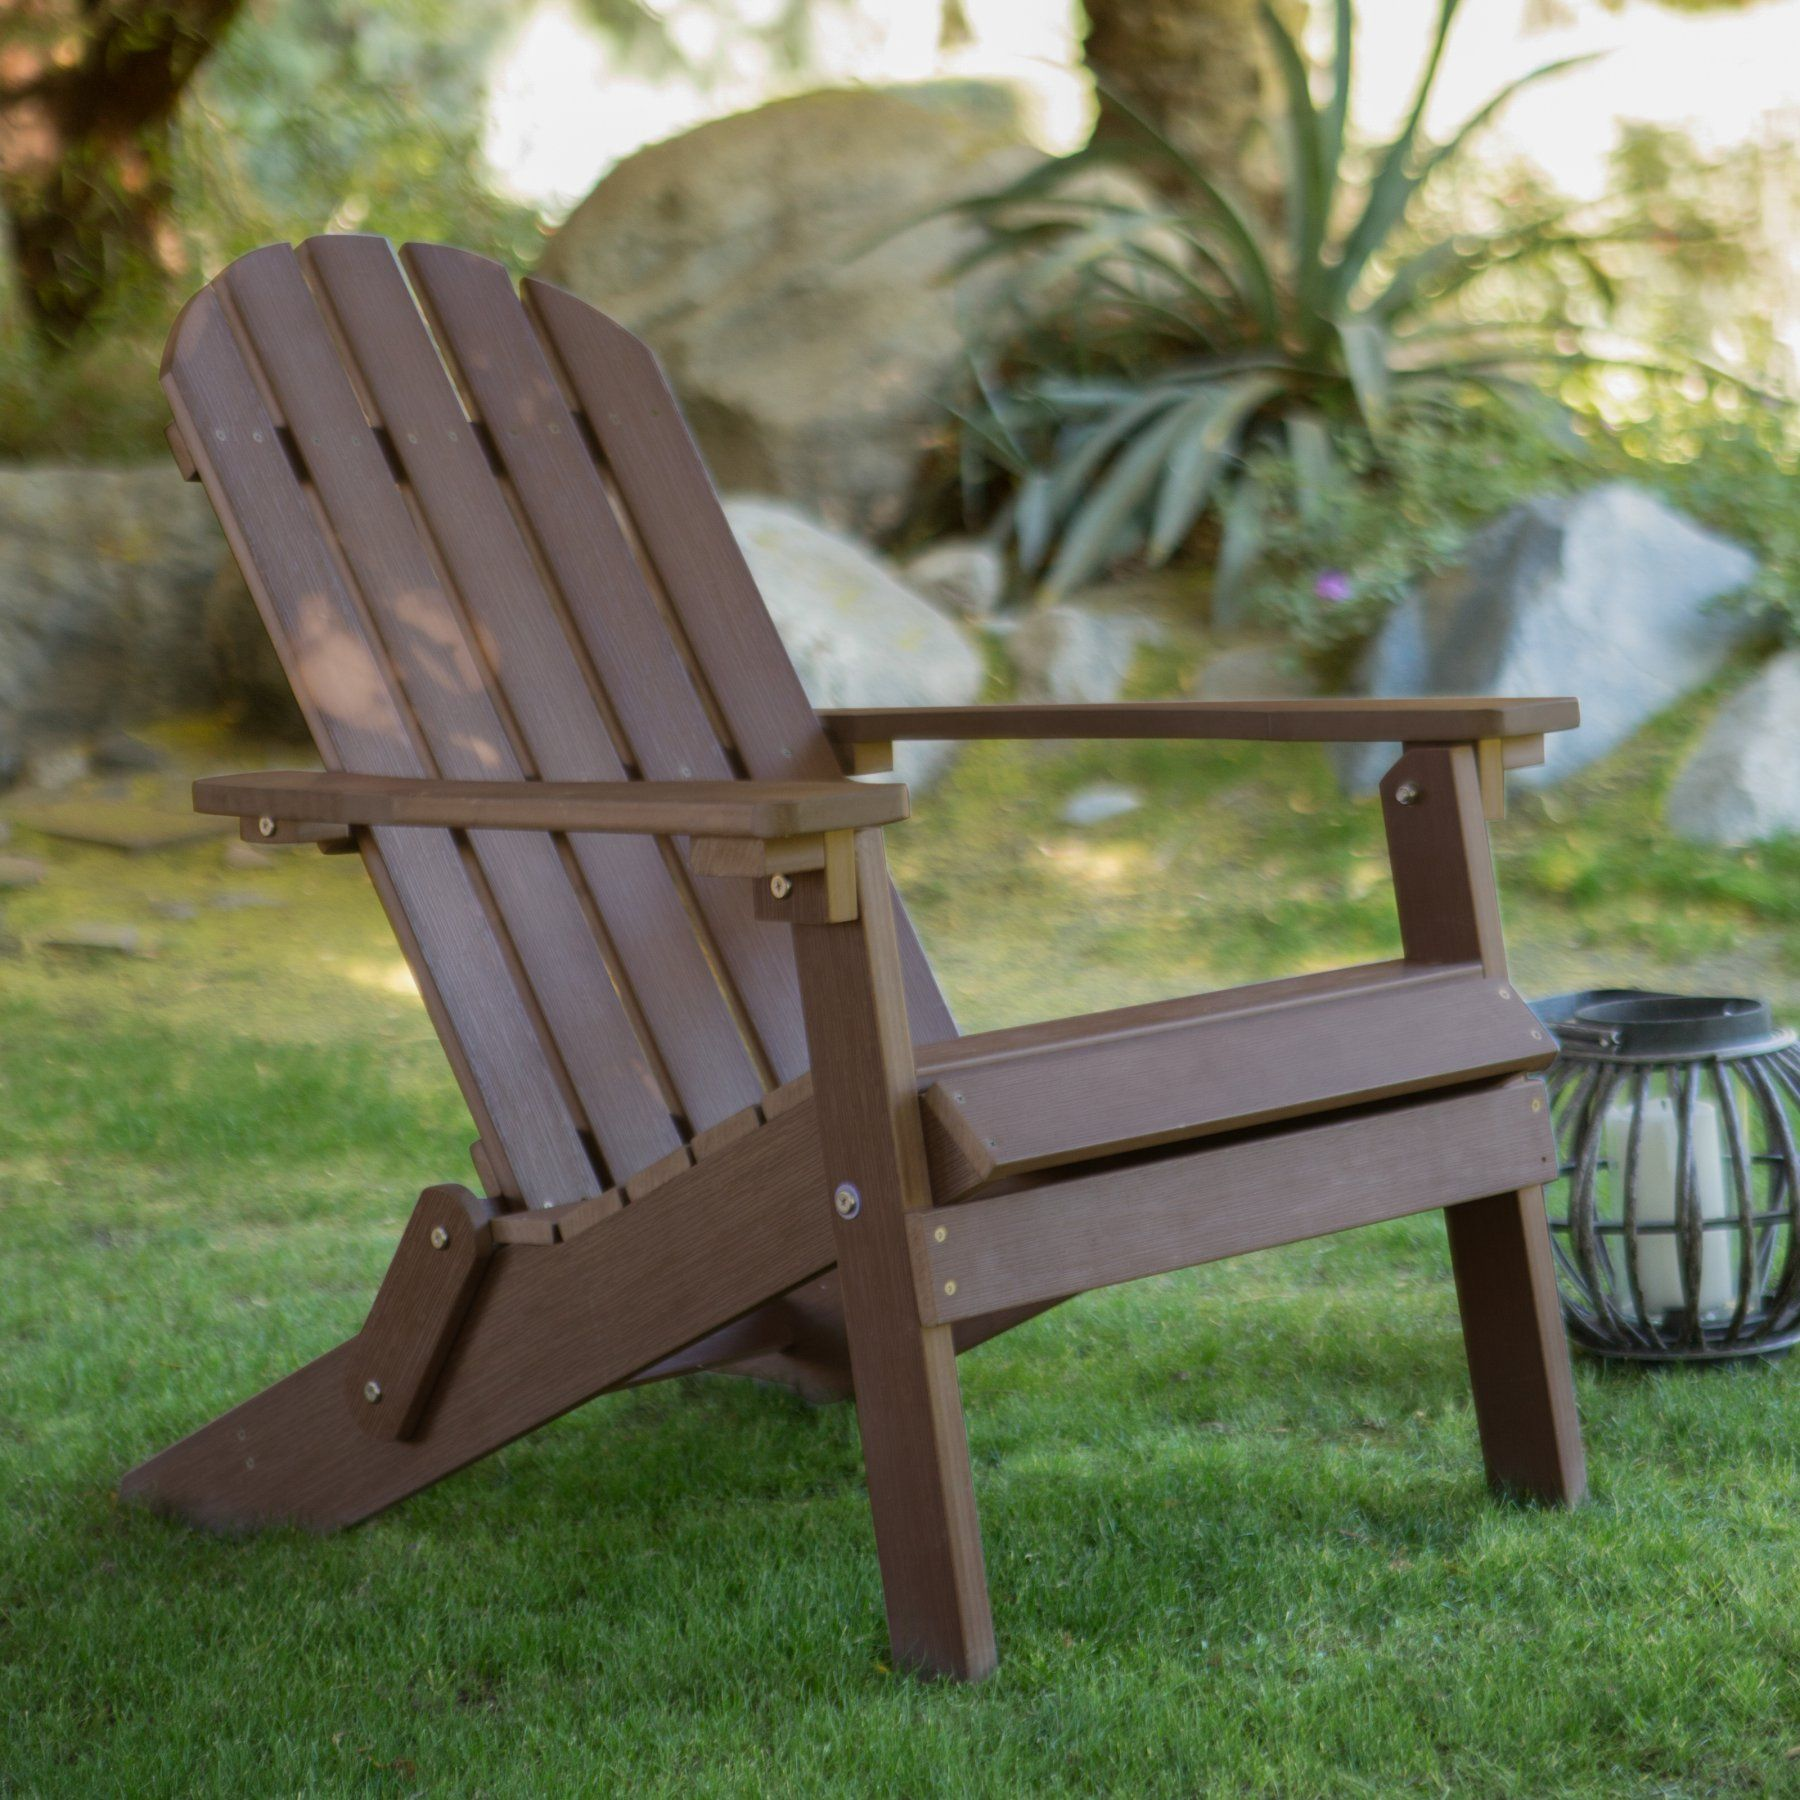 Outdoor Belham Living All Weather Resin Wood Adirondack Chair